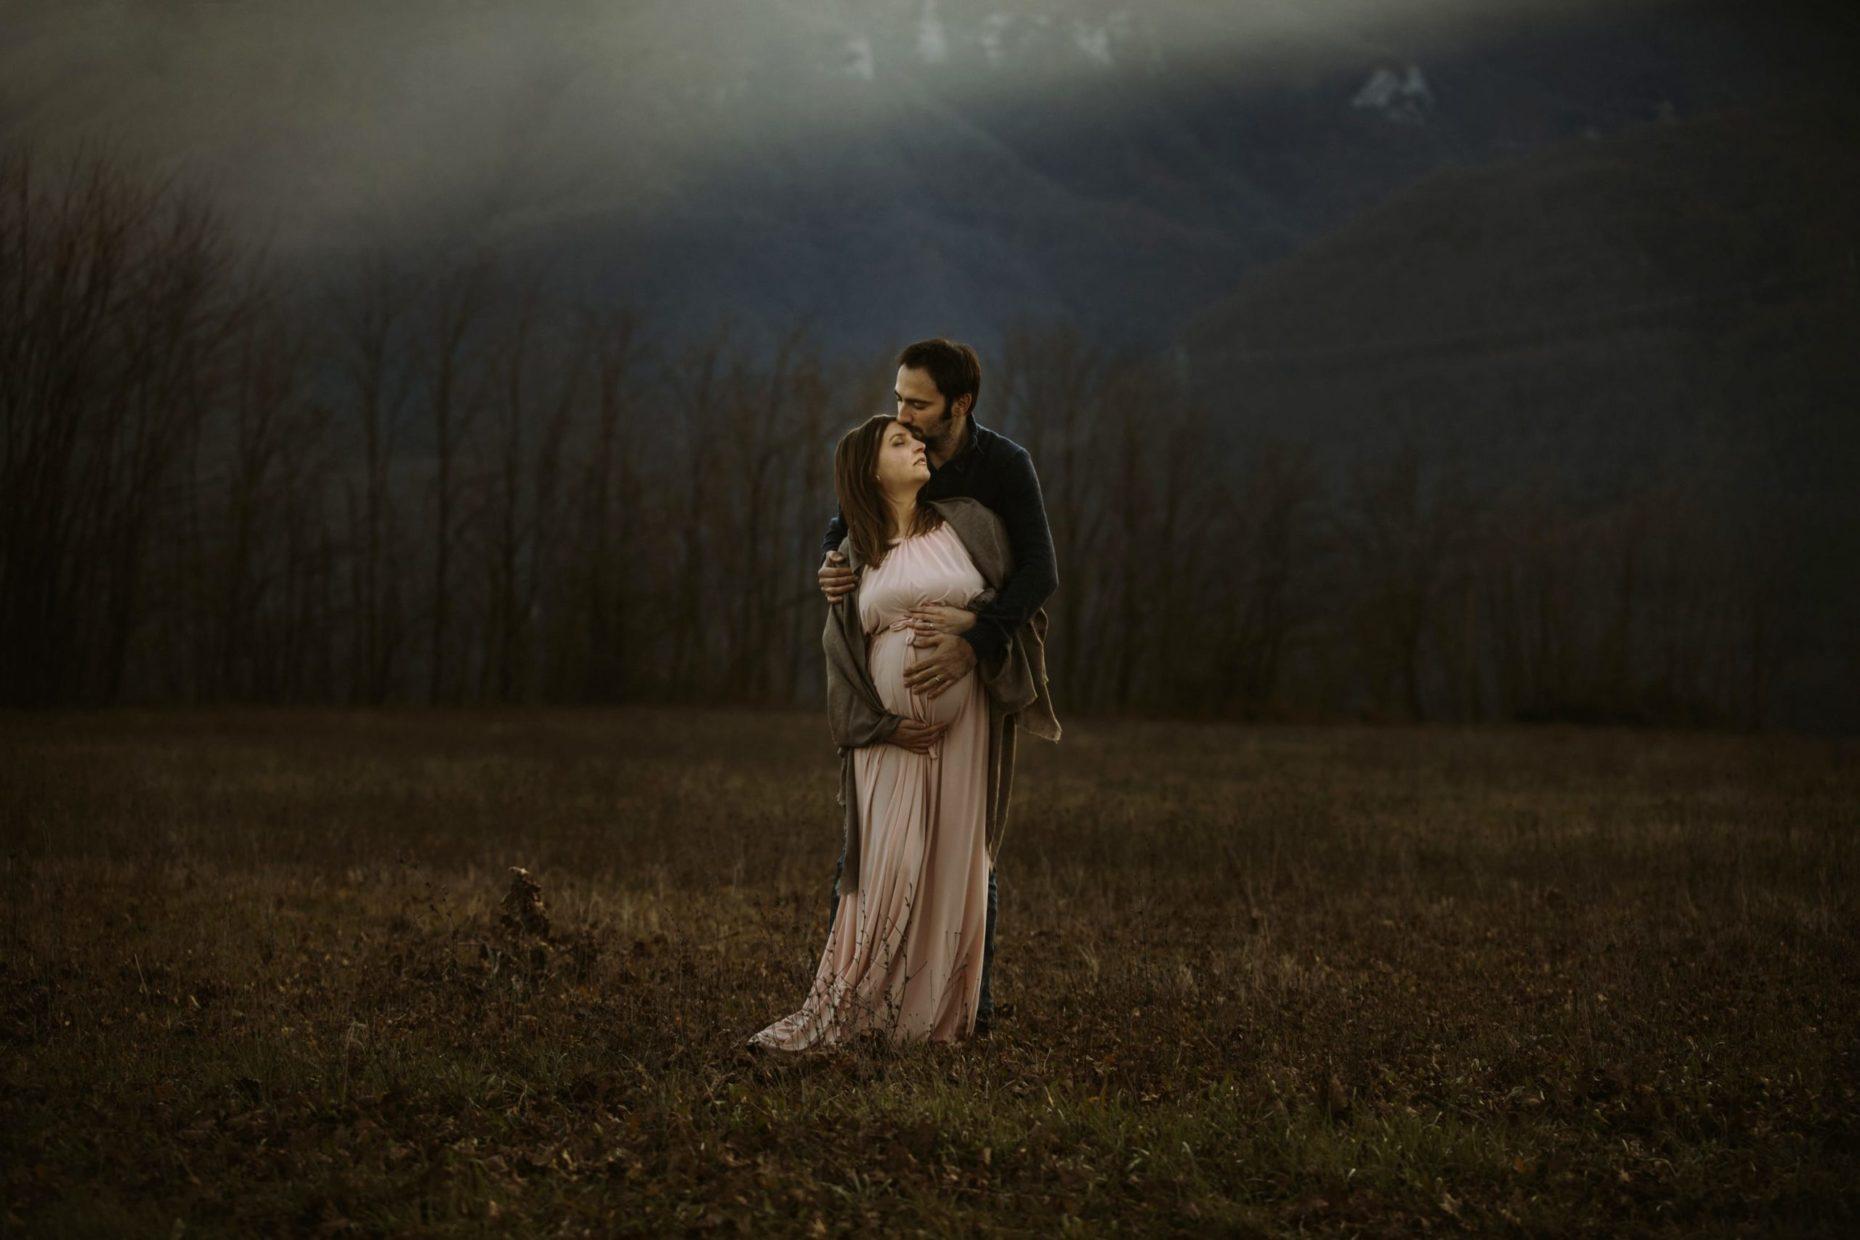 fotografa maternità lucca pisa montecatini versilia forte dei marmi pietrasanta viareggio massa